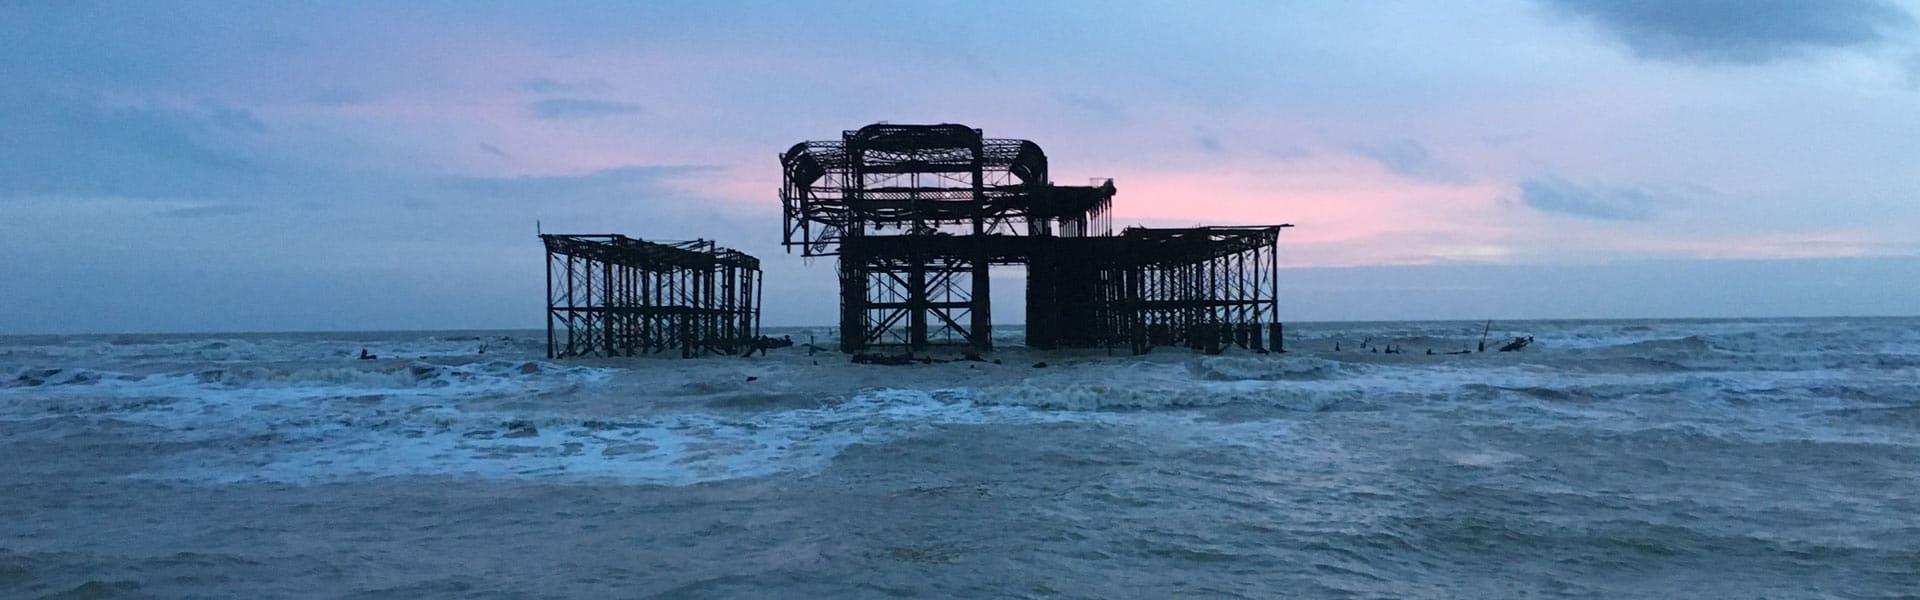 Image of Brighton Pier